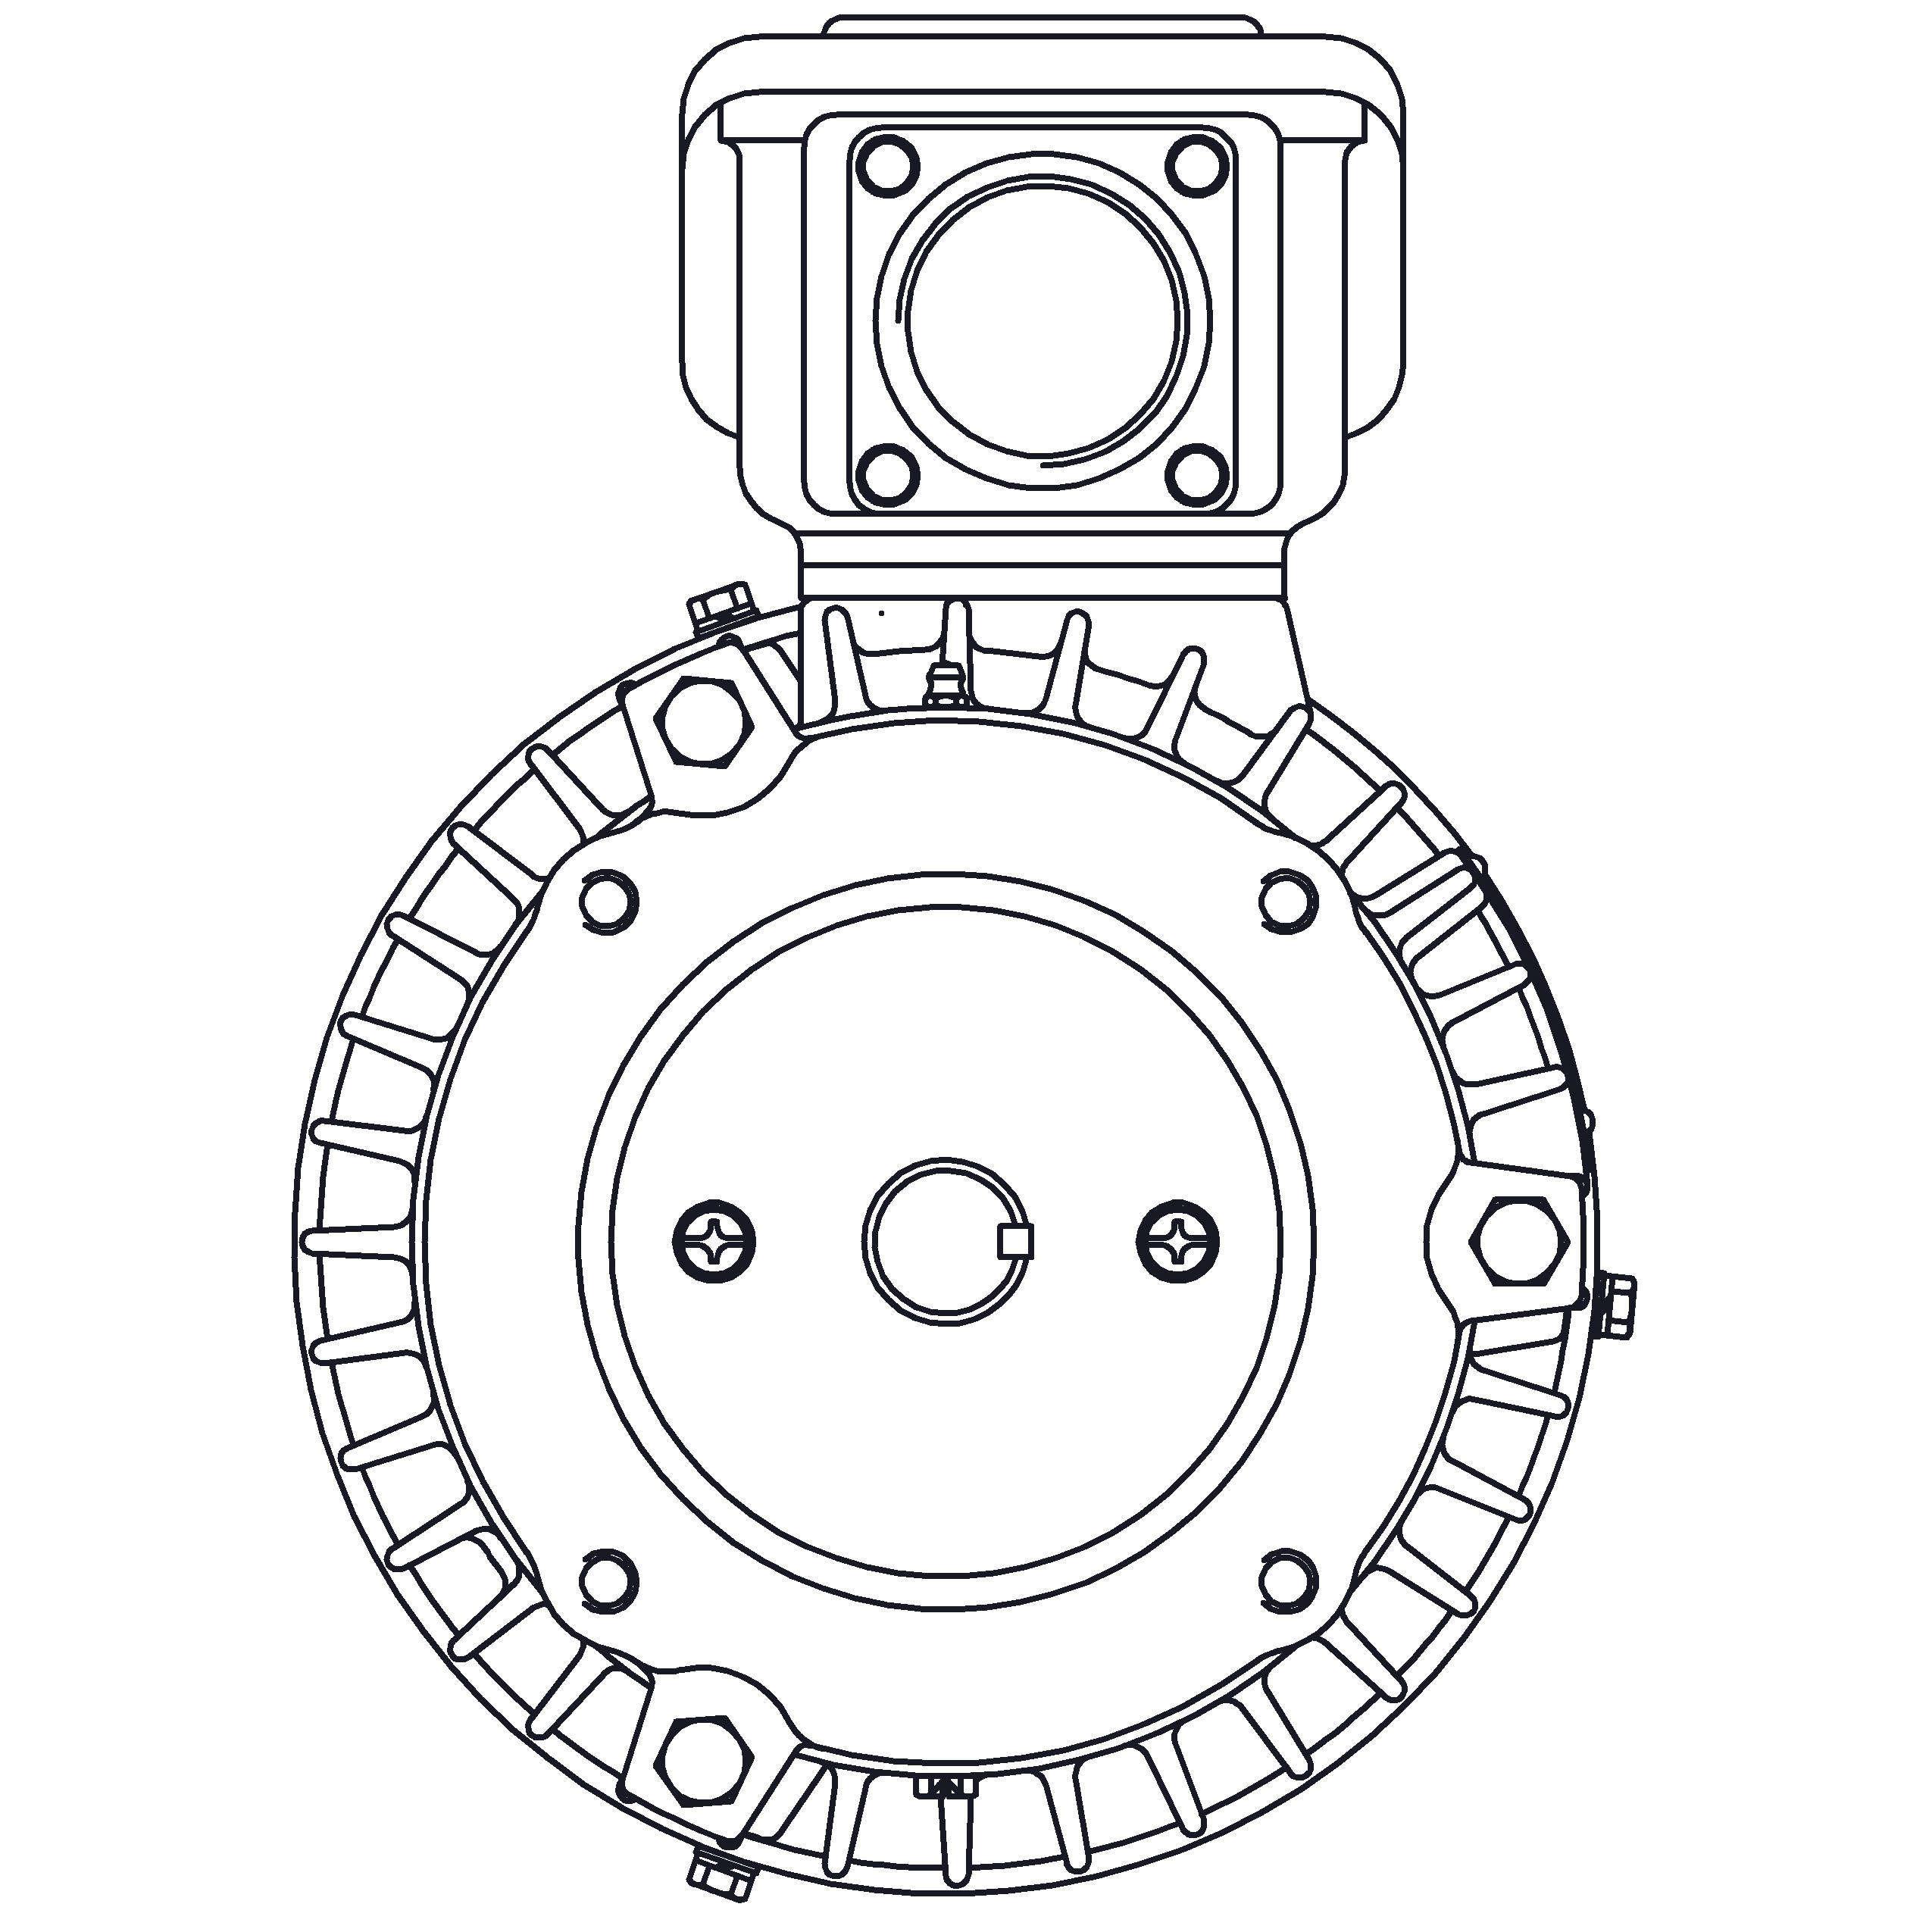 HBV0014C Teco-Westinghouse 1HP MAX-E2/841 Cast Iron